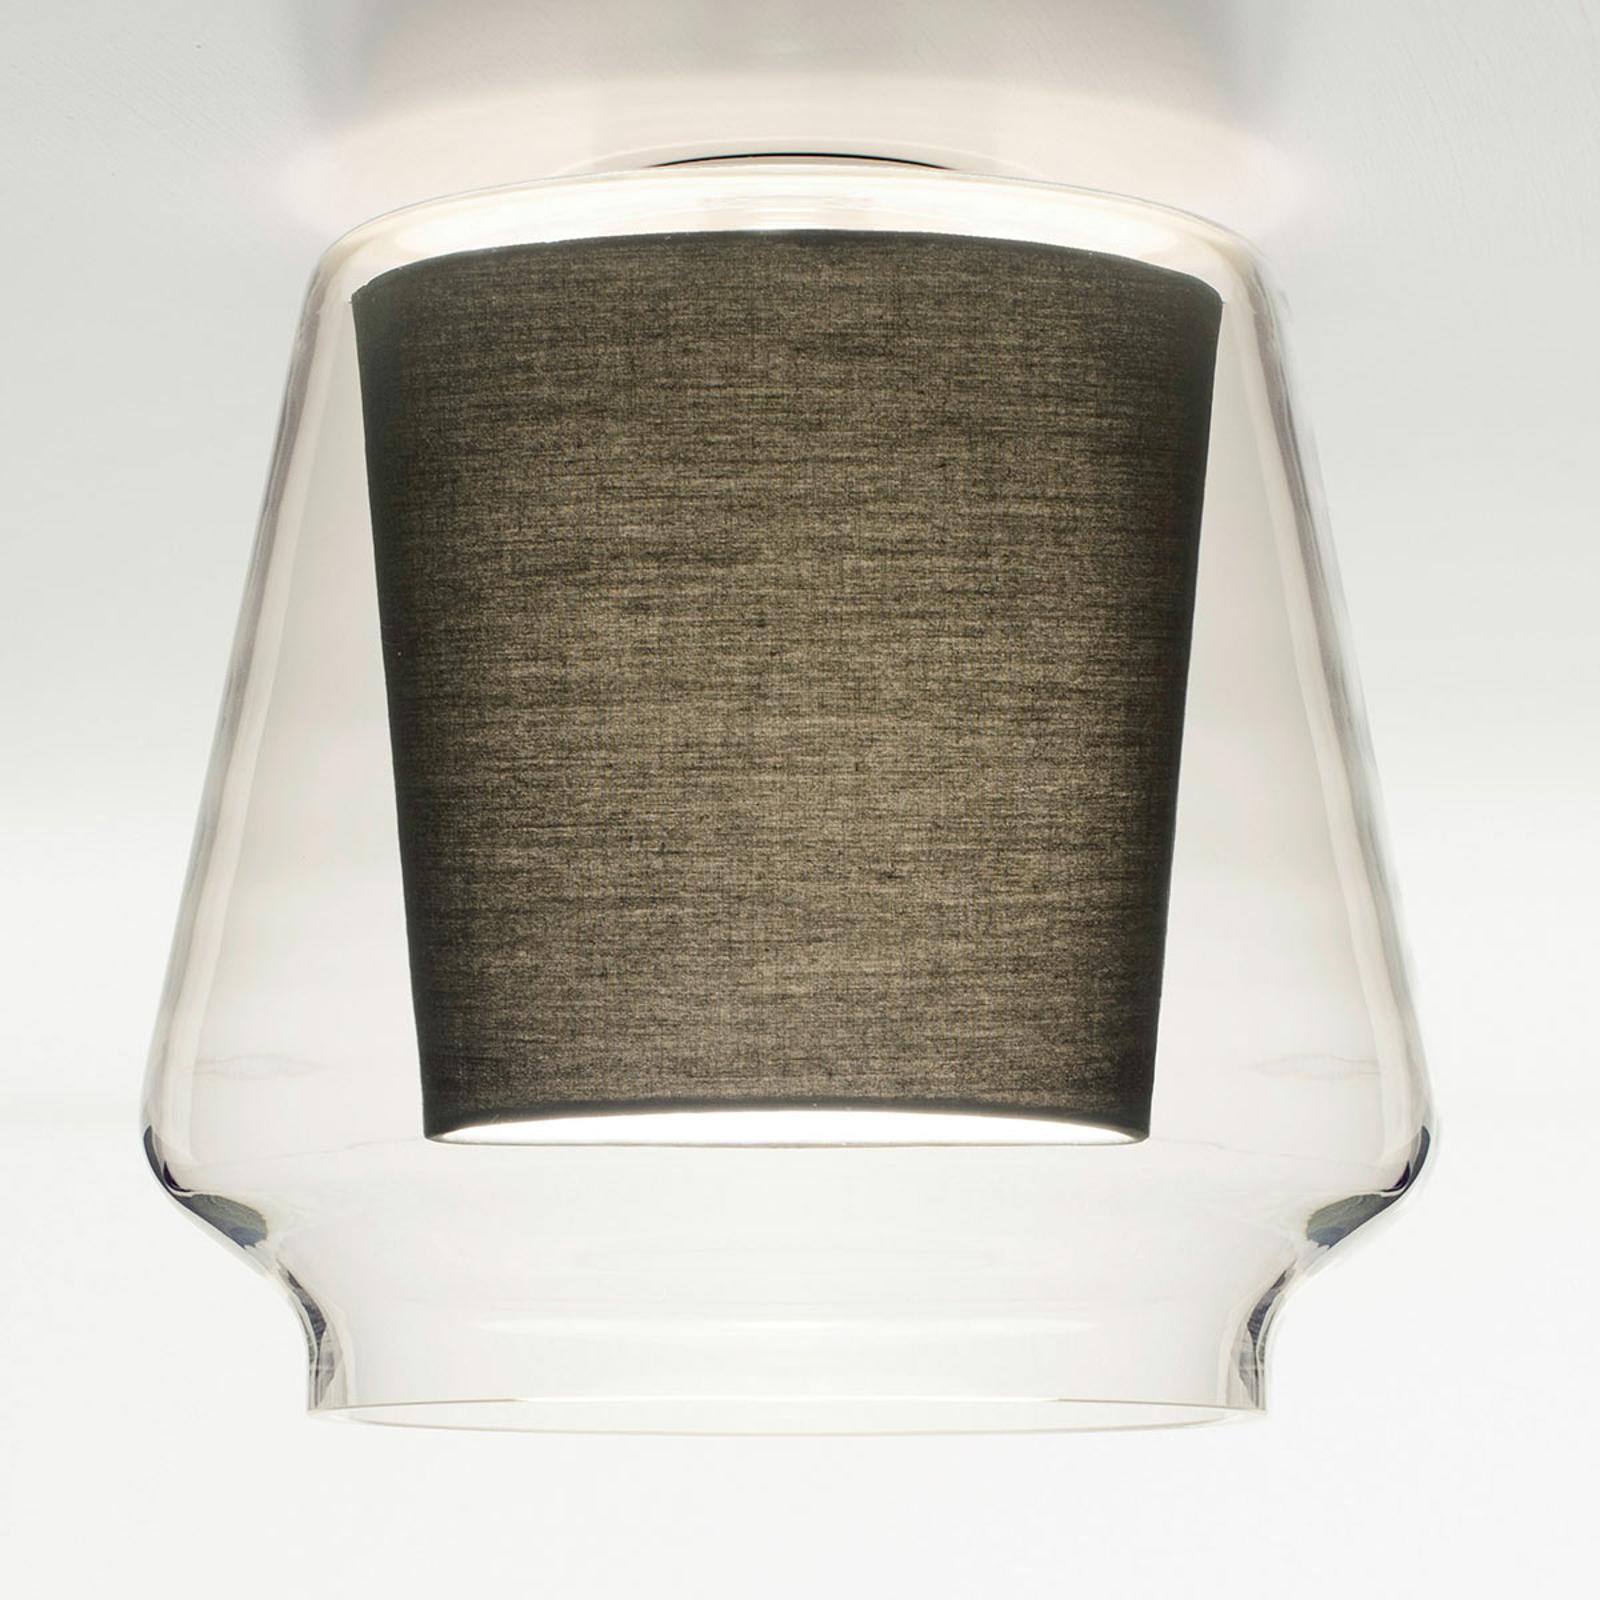 Casablanca Aleve plafonnier transparent anthracite